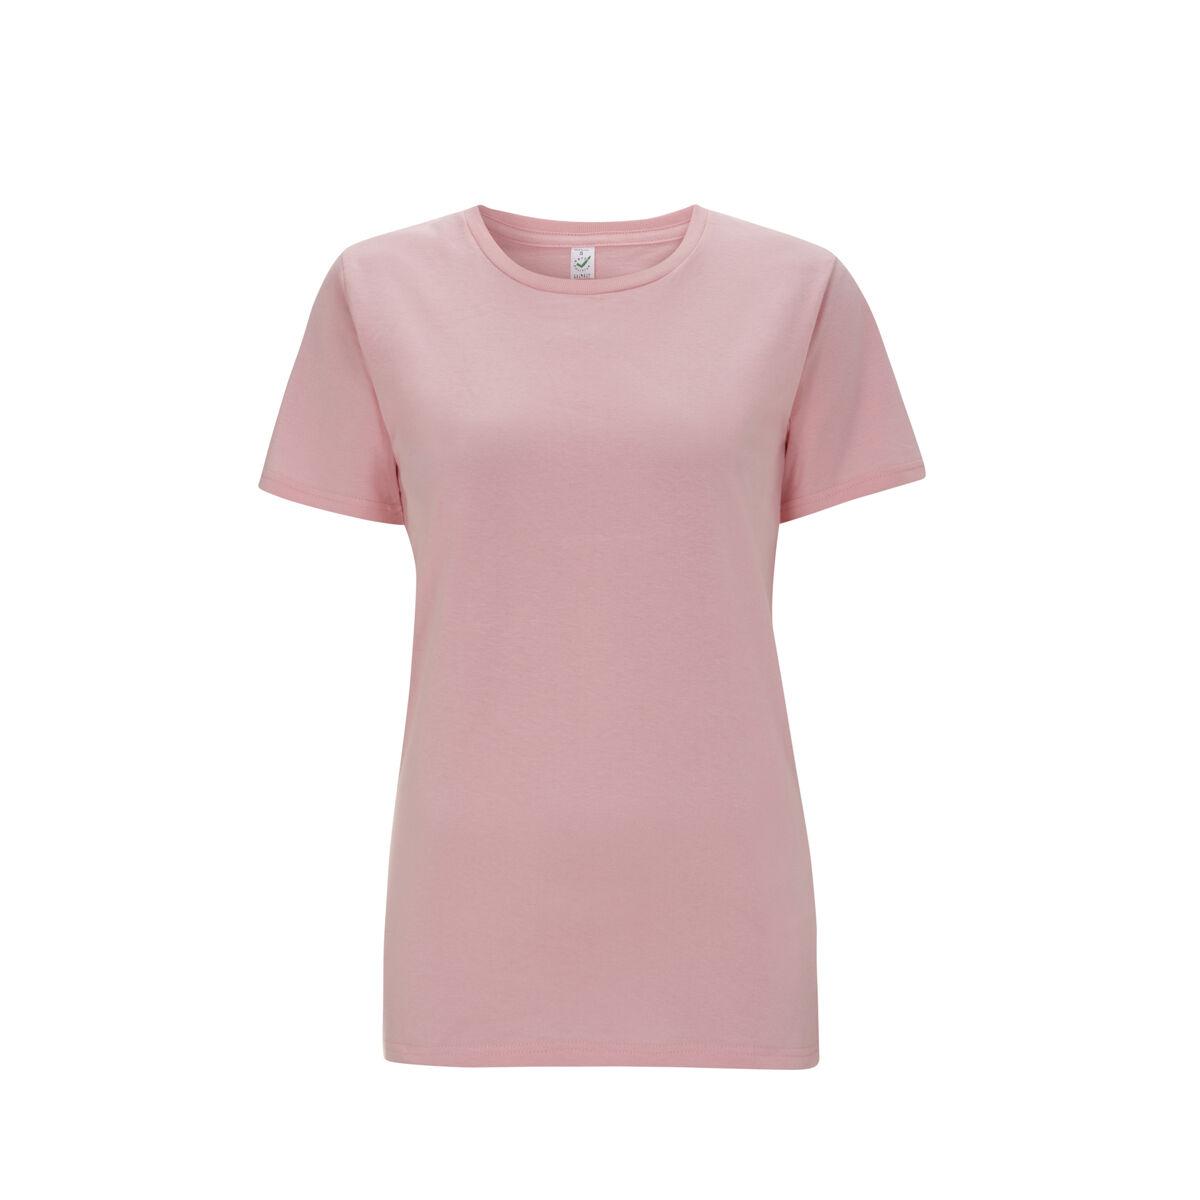 Organic Earth Positive Ladies T-Shirts Pink